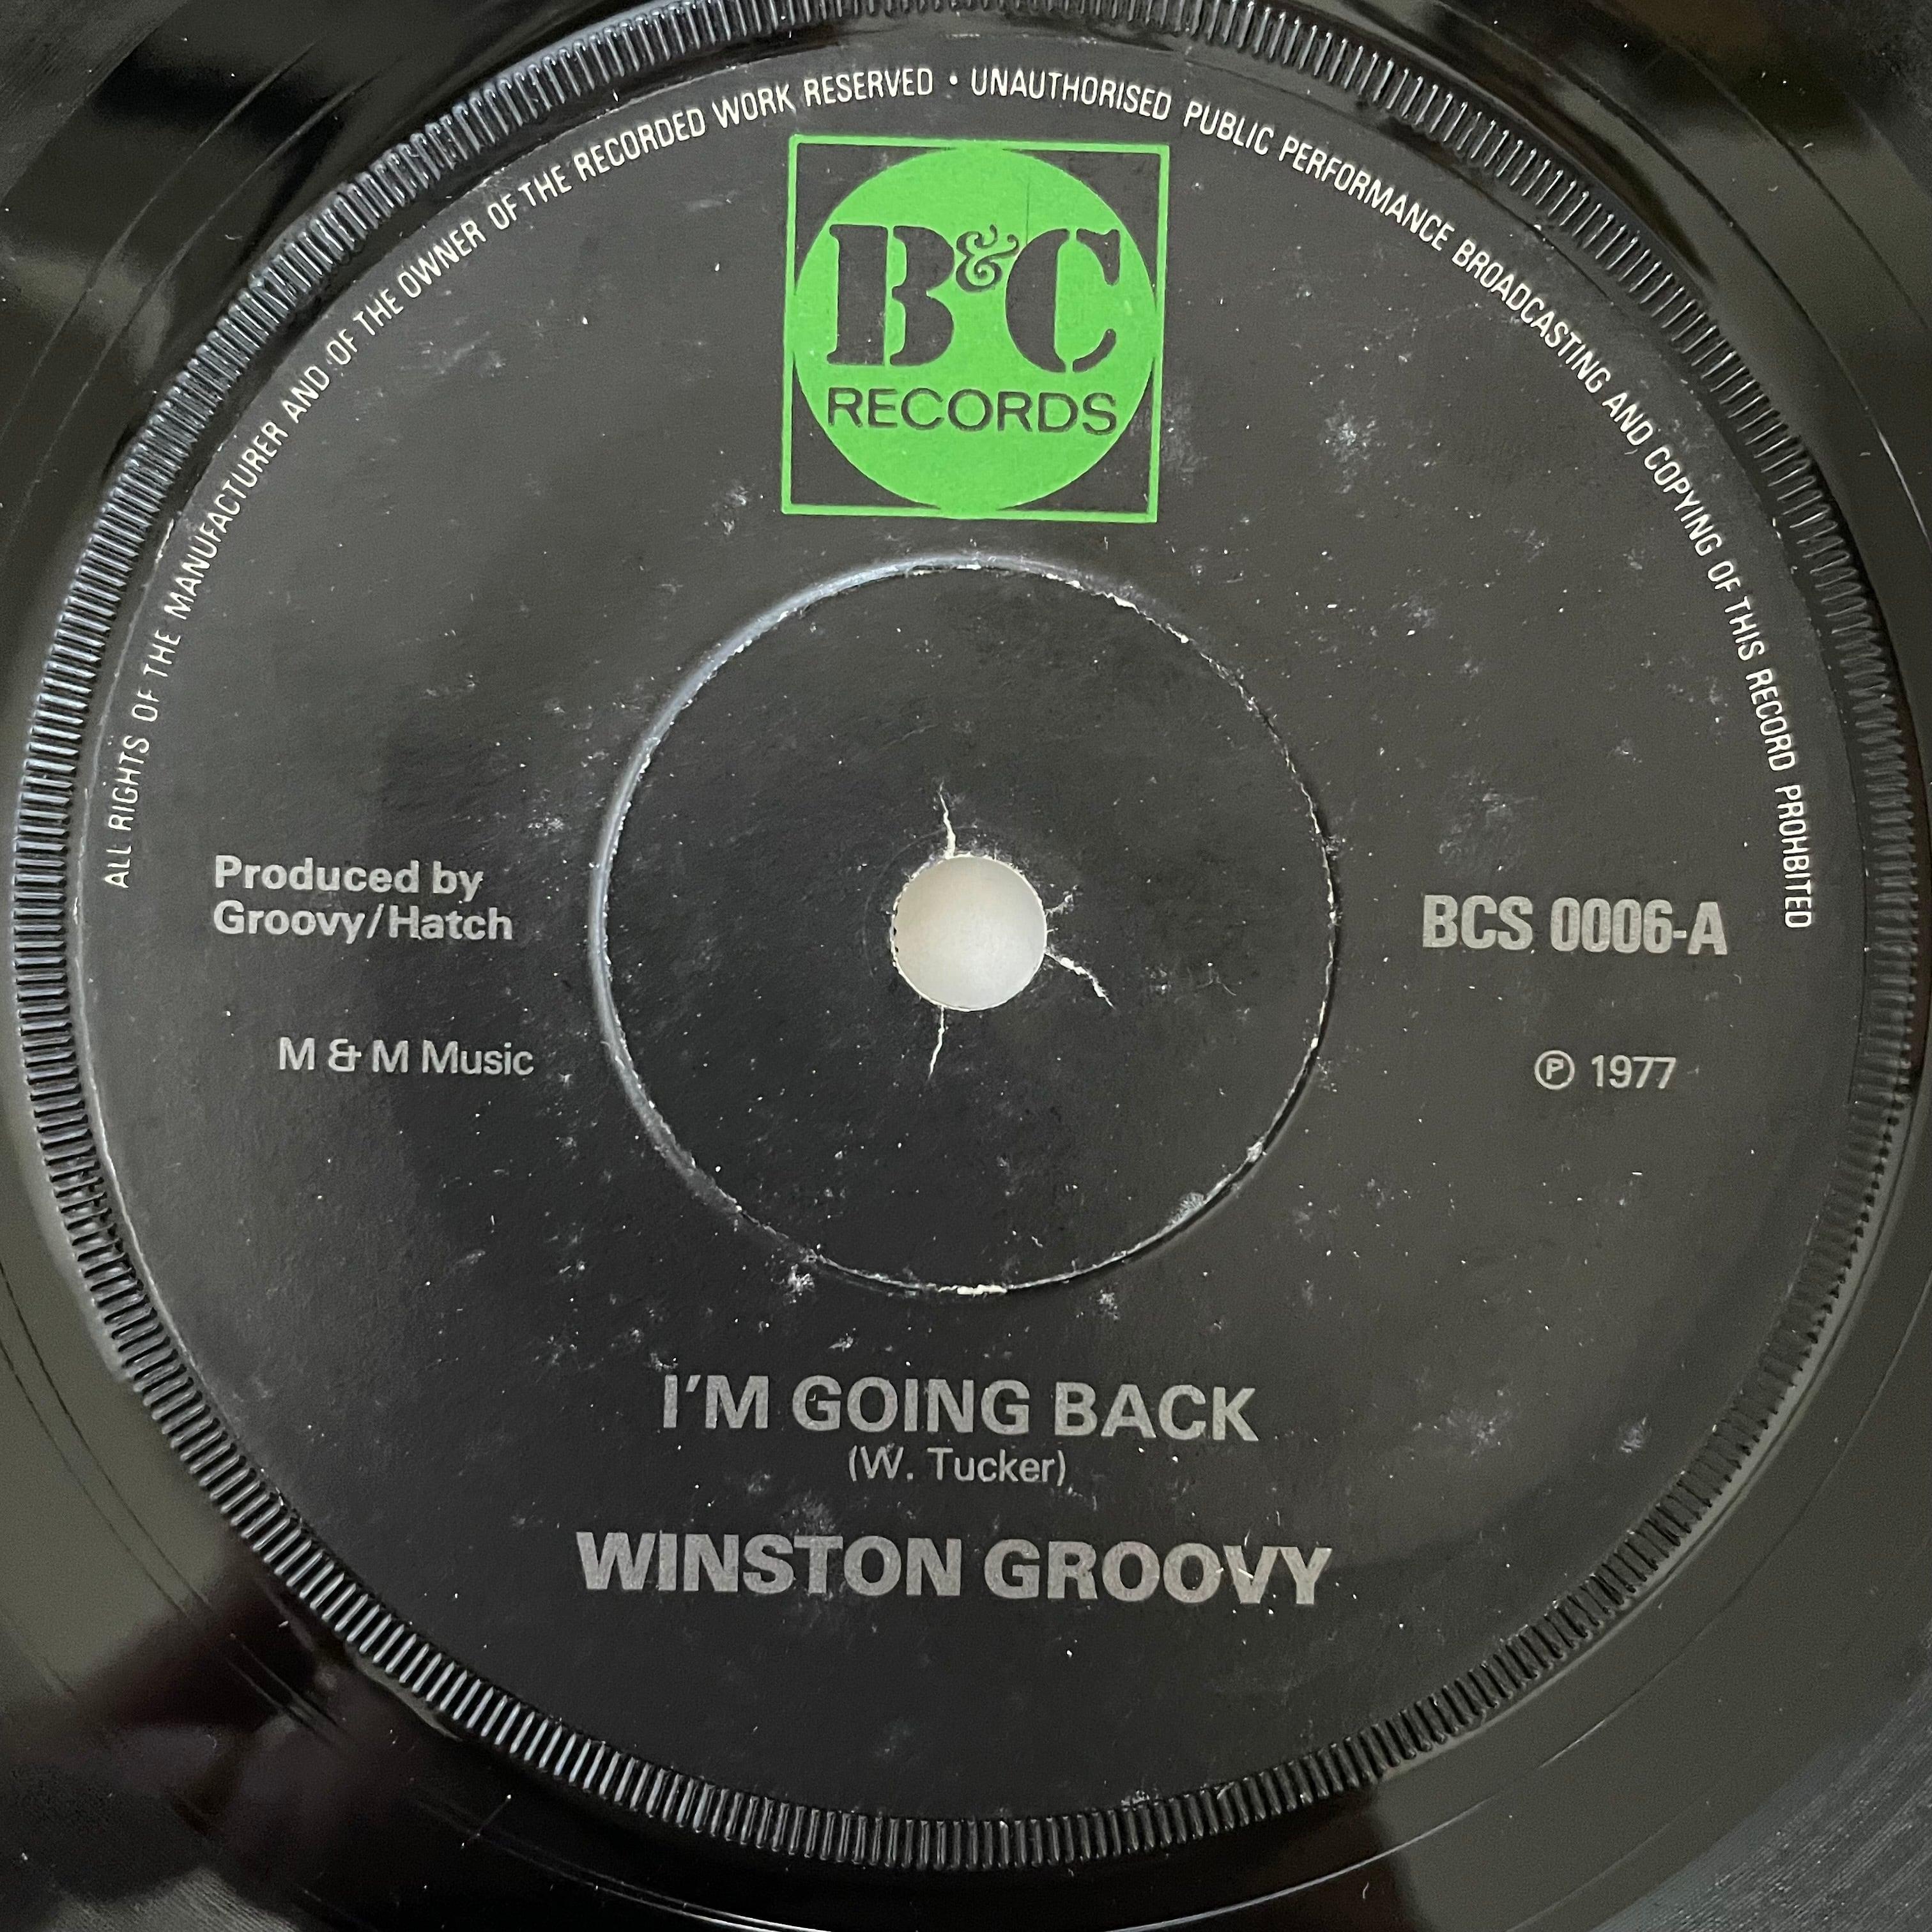 Winston Groovy - I'm Going Back【7-20774】